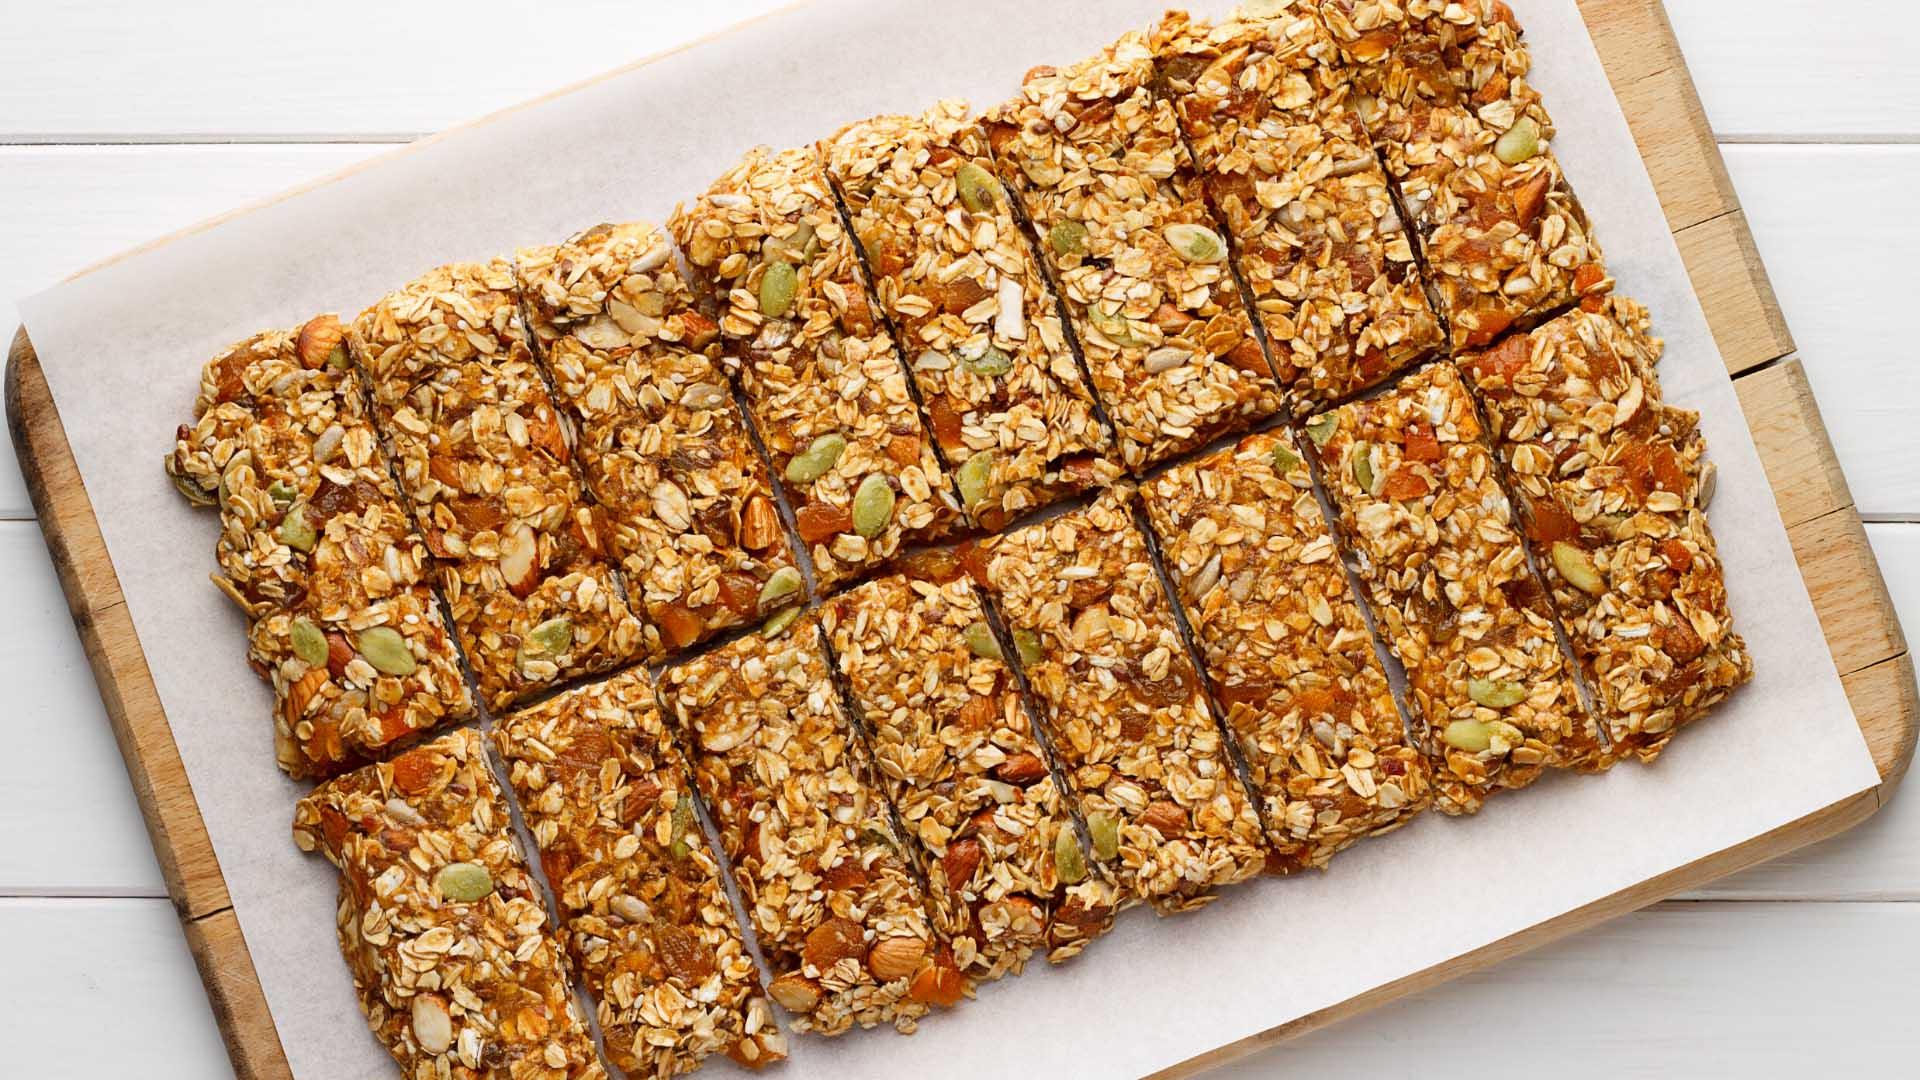 Image of Homemade Granola Bars